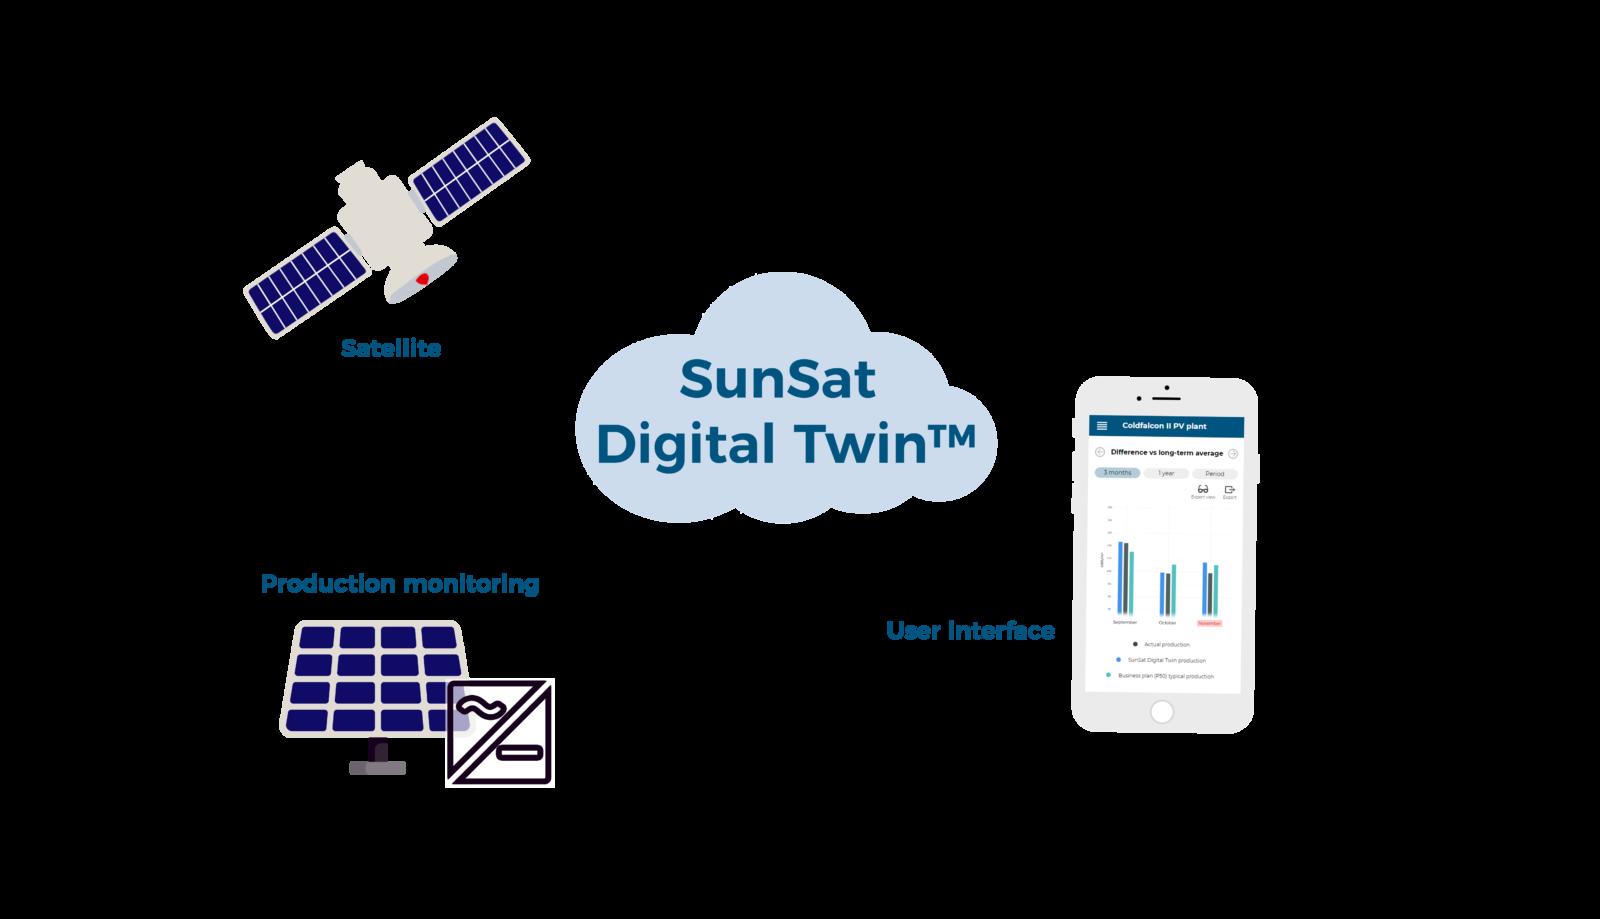 Solar Asset Management avec SunSat™ Digital Twin